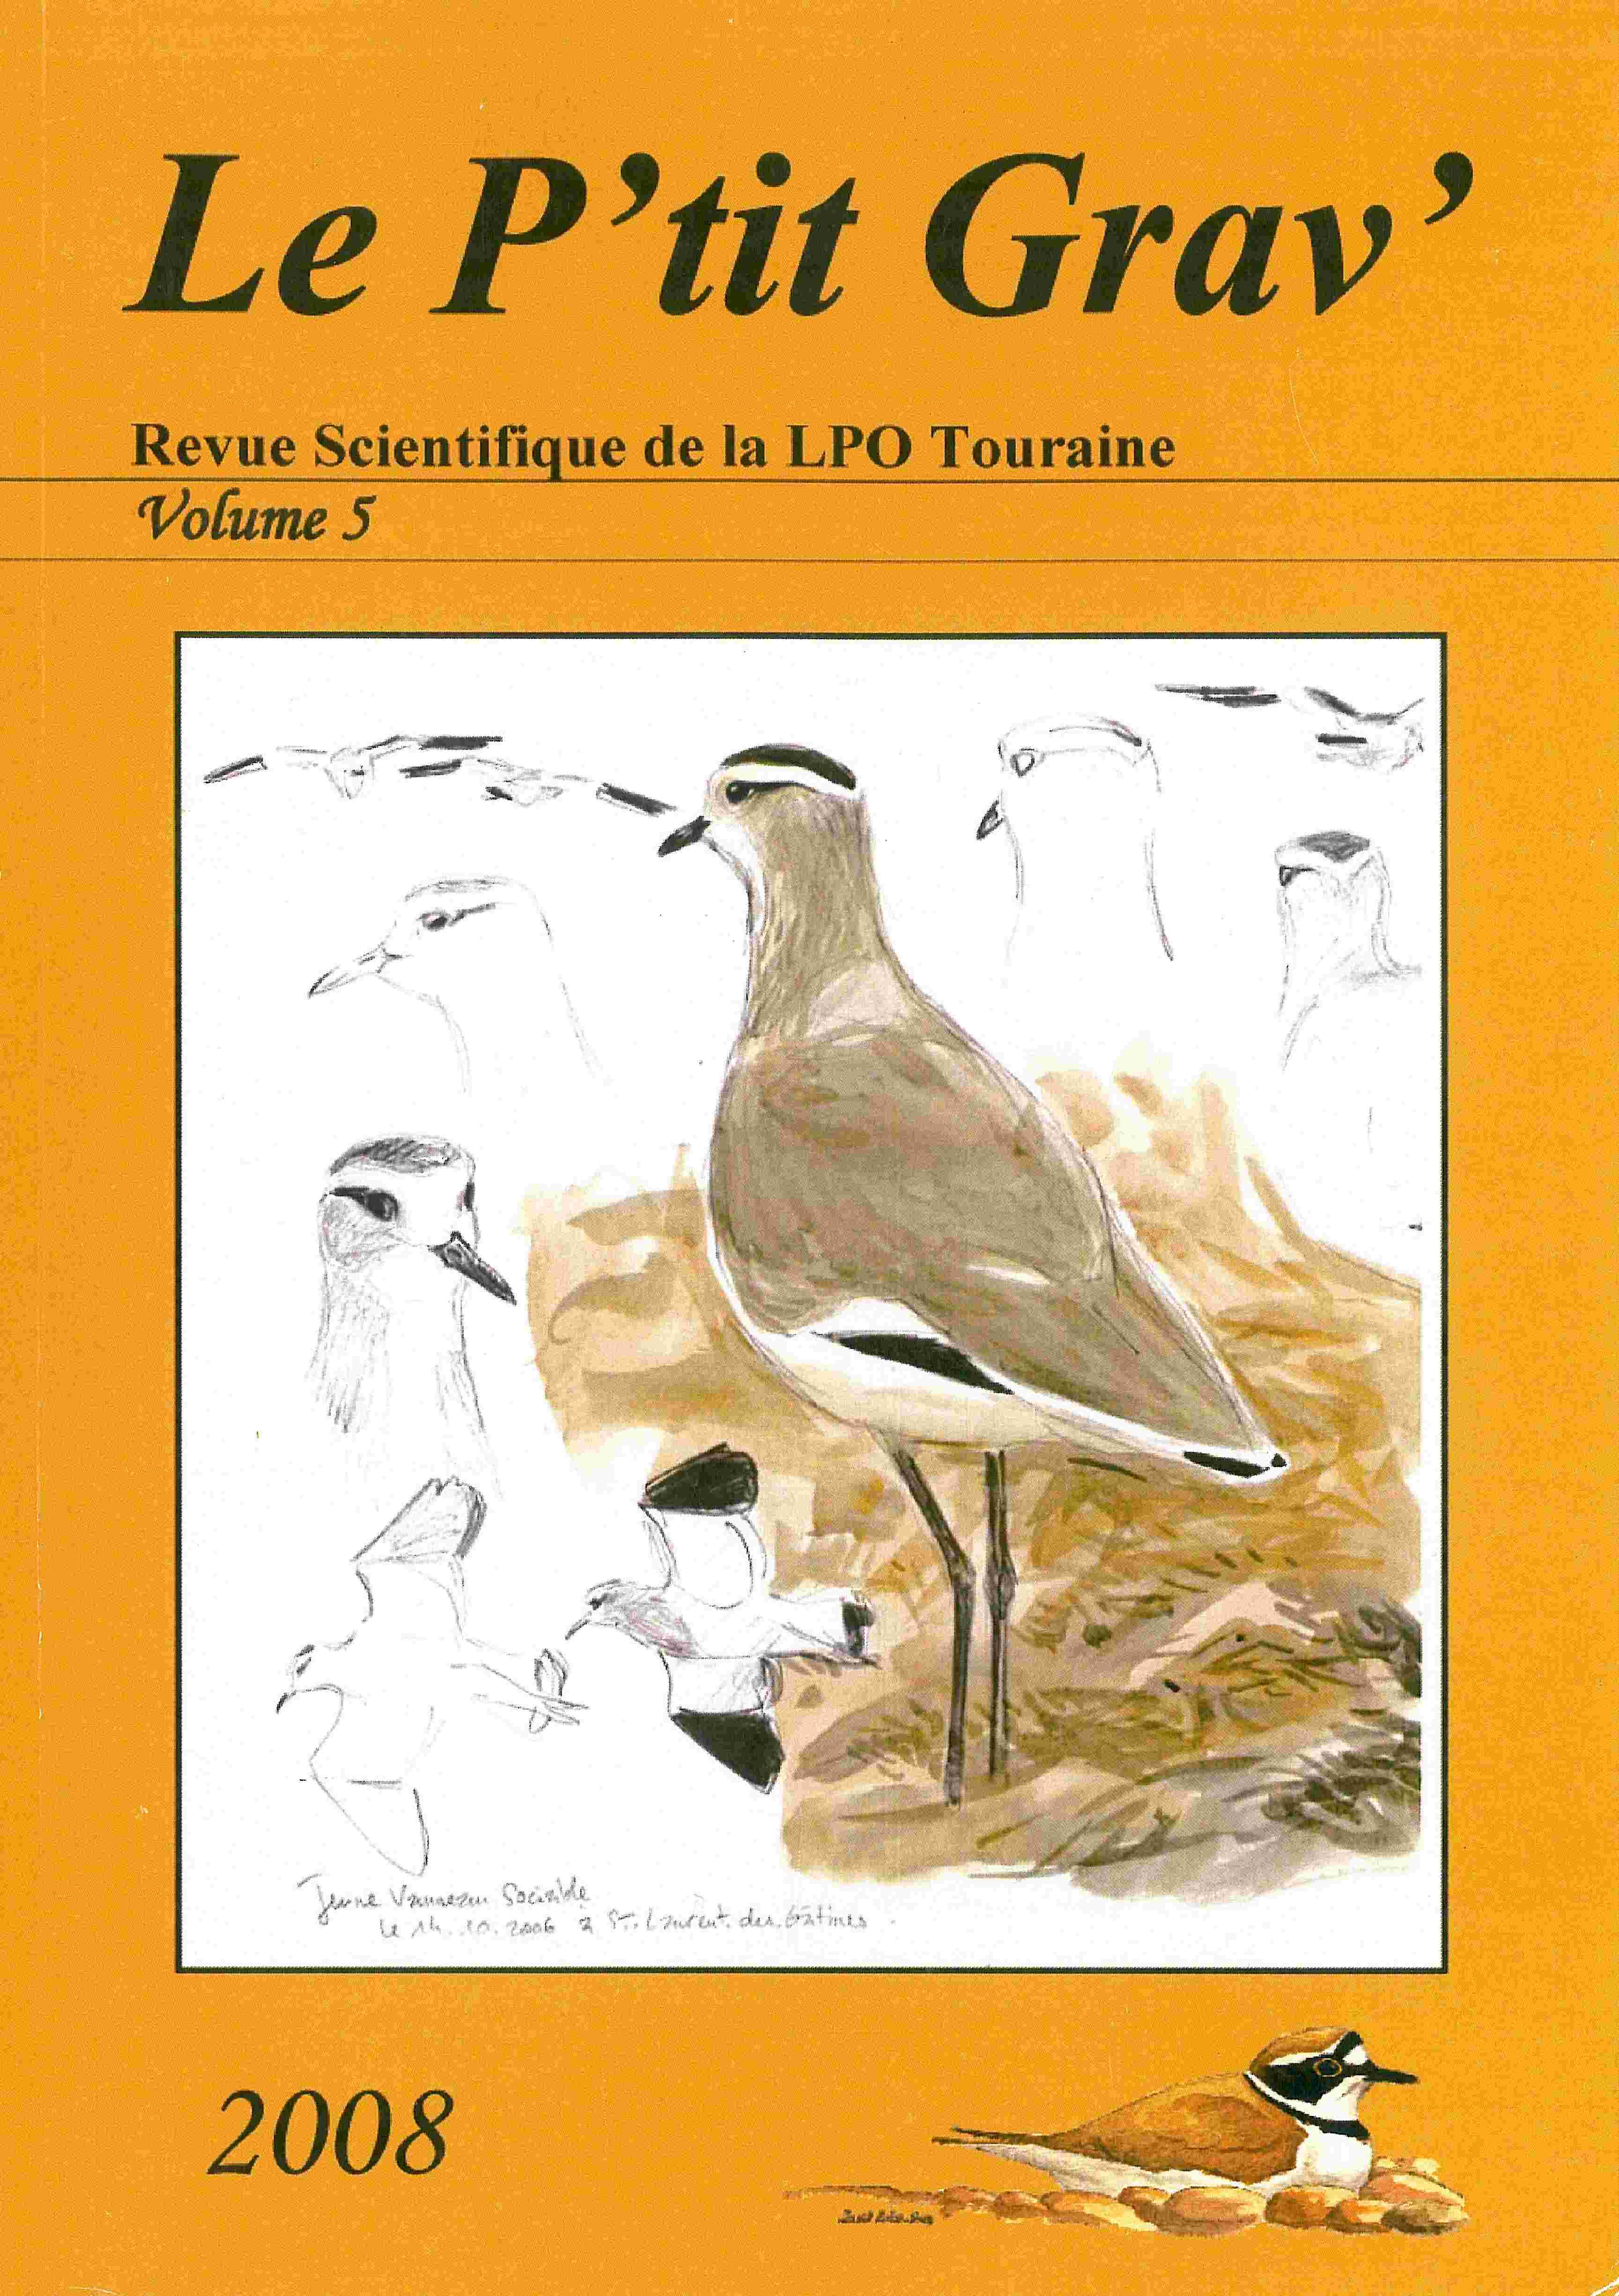 http://files.biolovision.net/www.faune-touraine.org/userfiles/MonDossier/PtitGravvol5.jpg